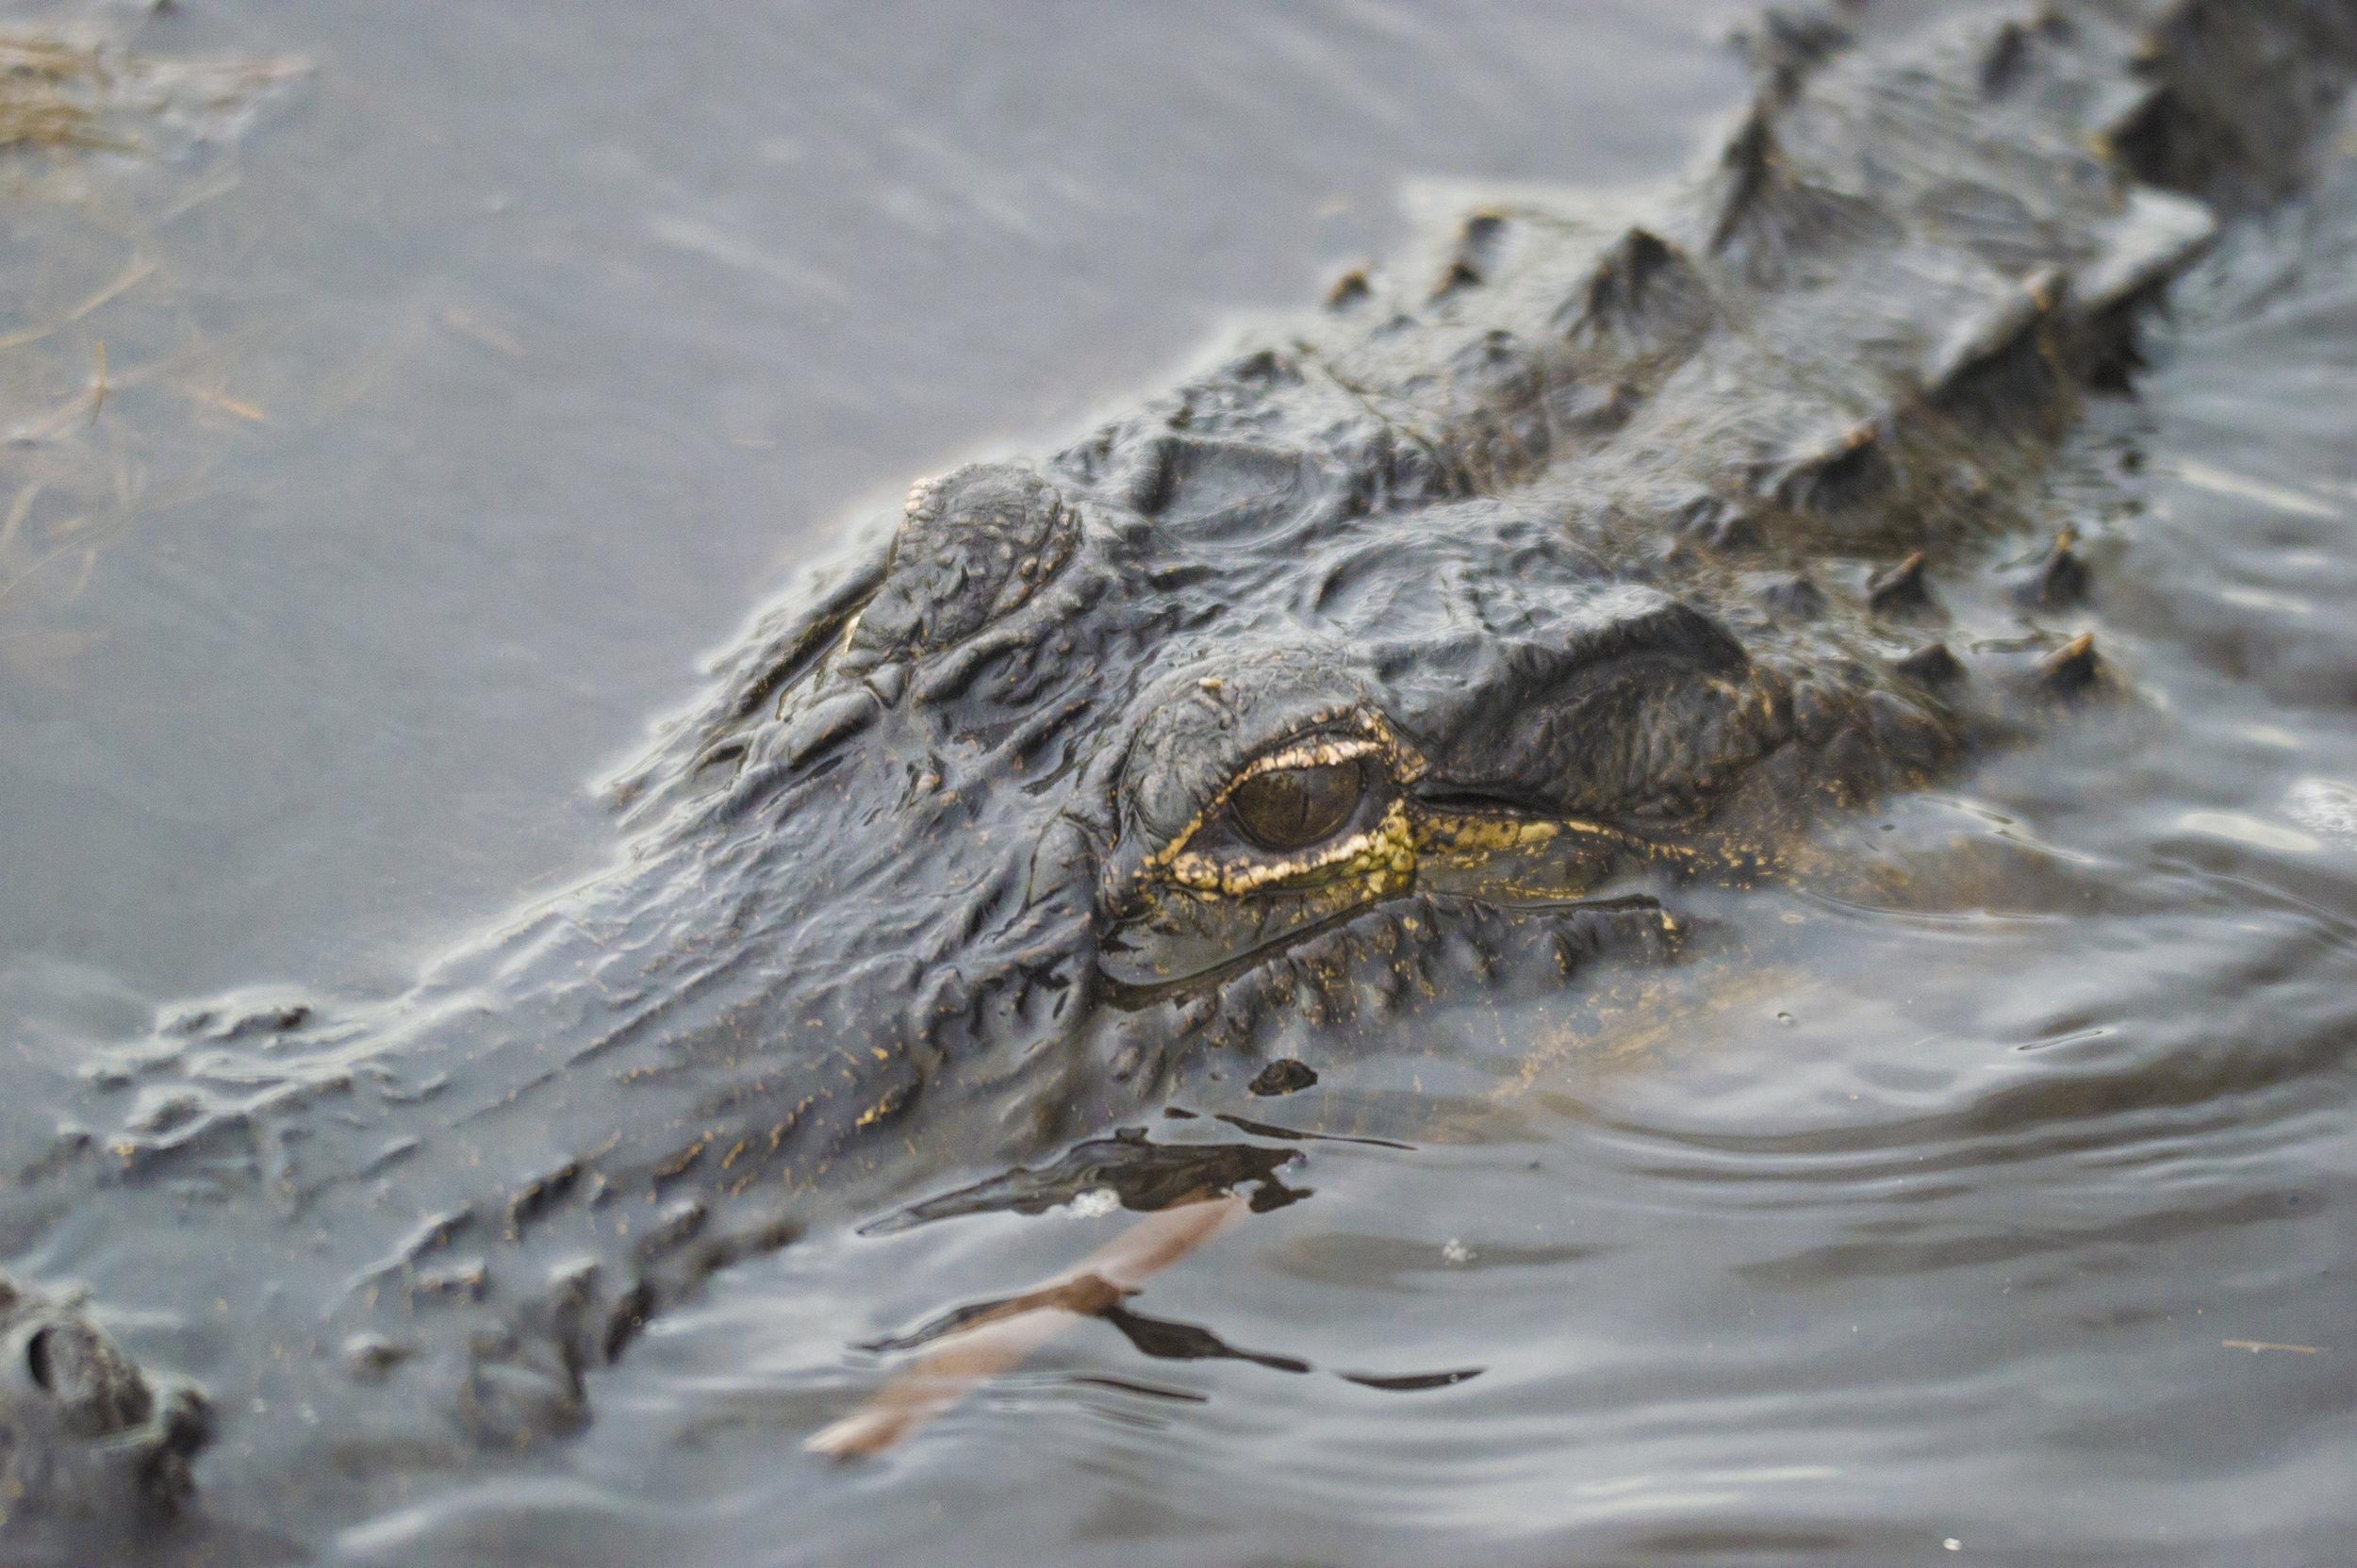 Alligator at Everglades National Park, Florida